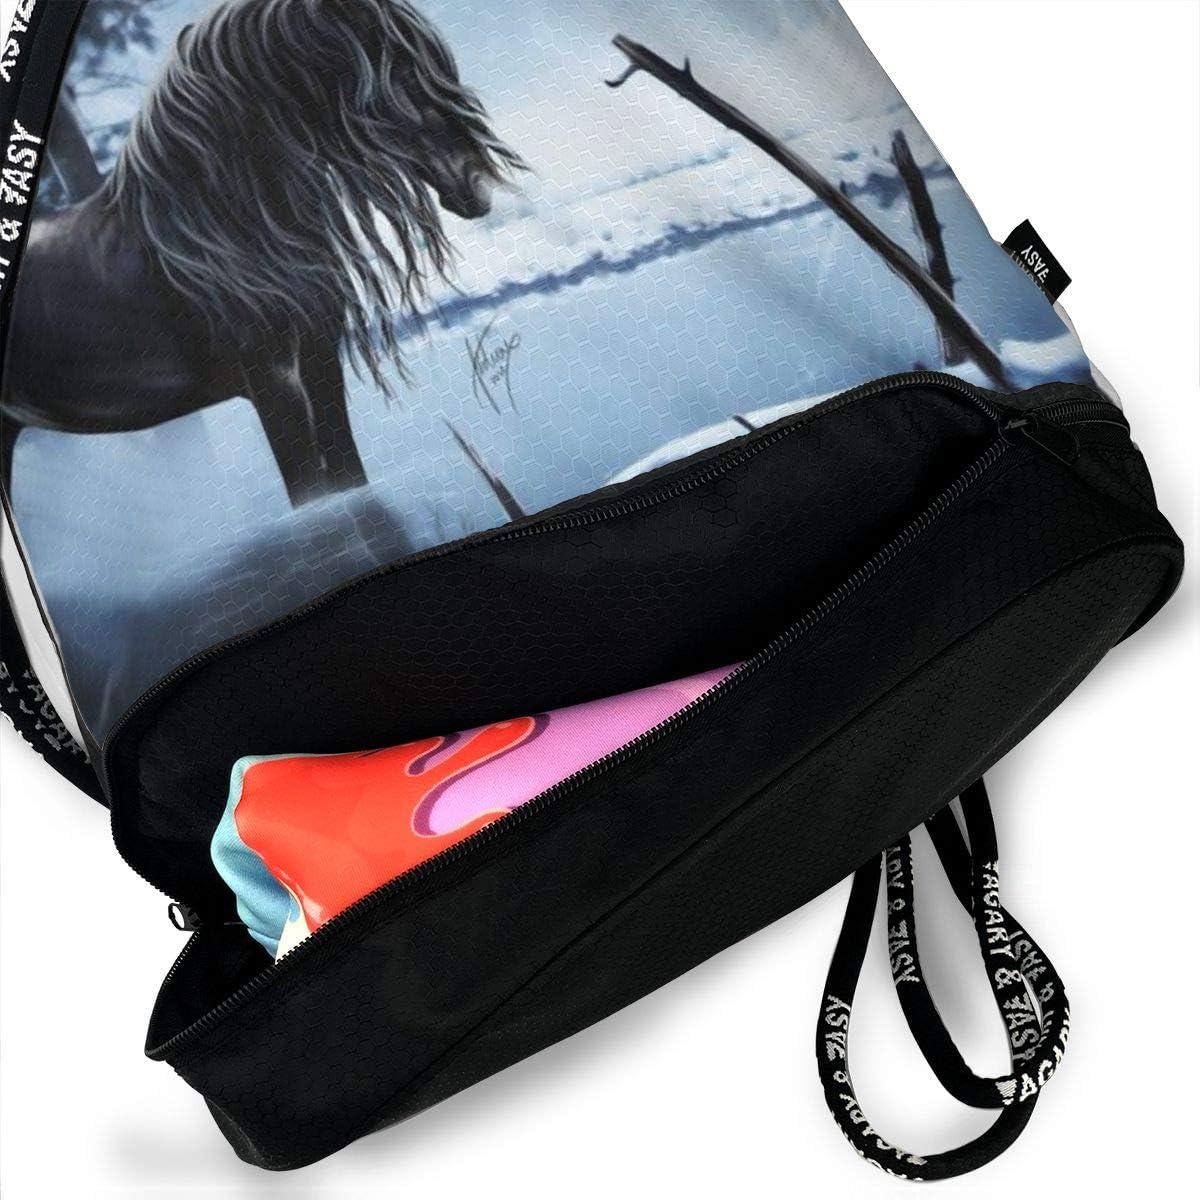 GymSack Drawstring Bag Sackpack Winter Horses Sport Cinch Pack Simple Bundle Pocke Backpack For Men Women